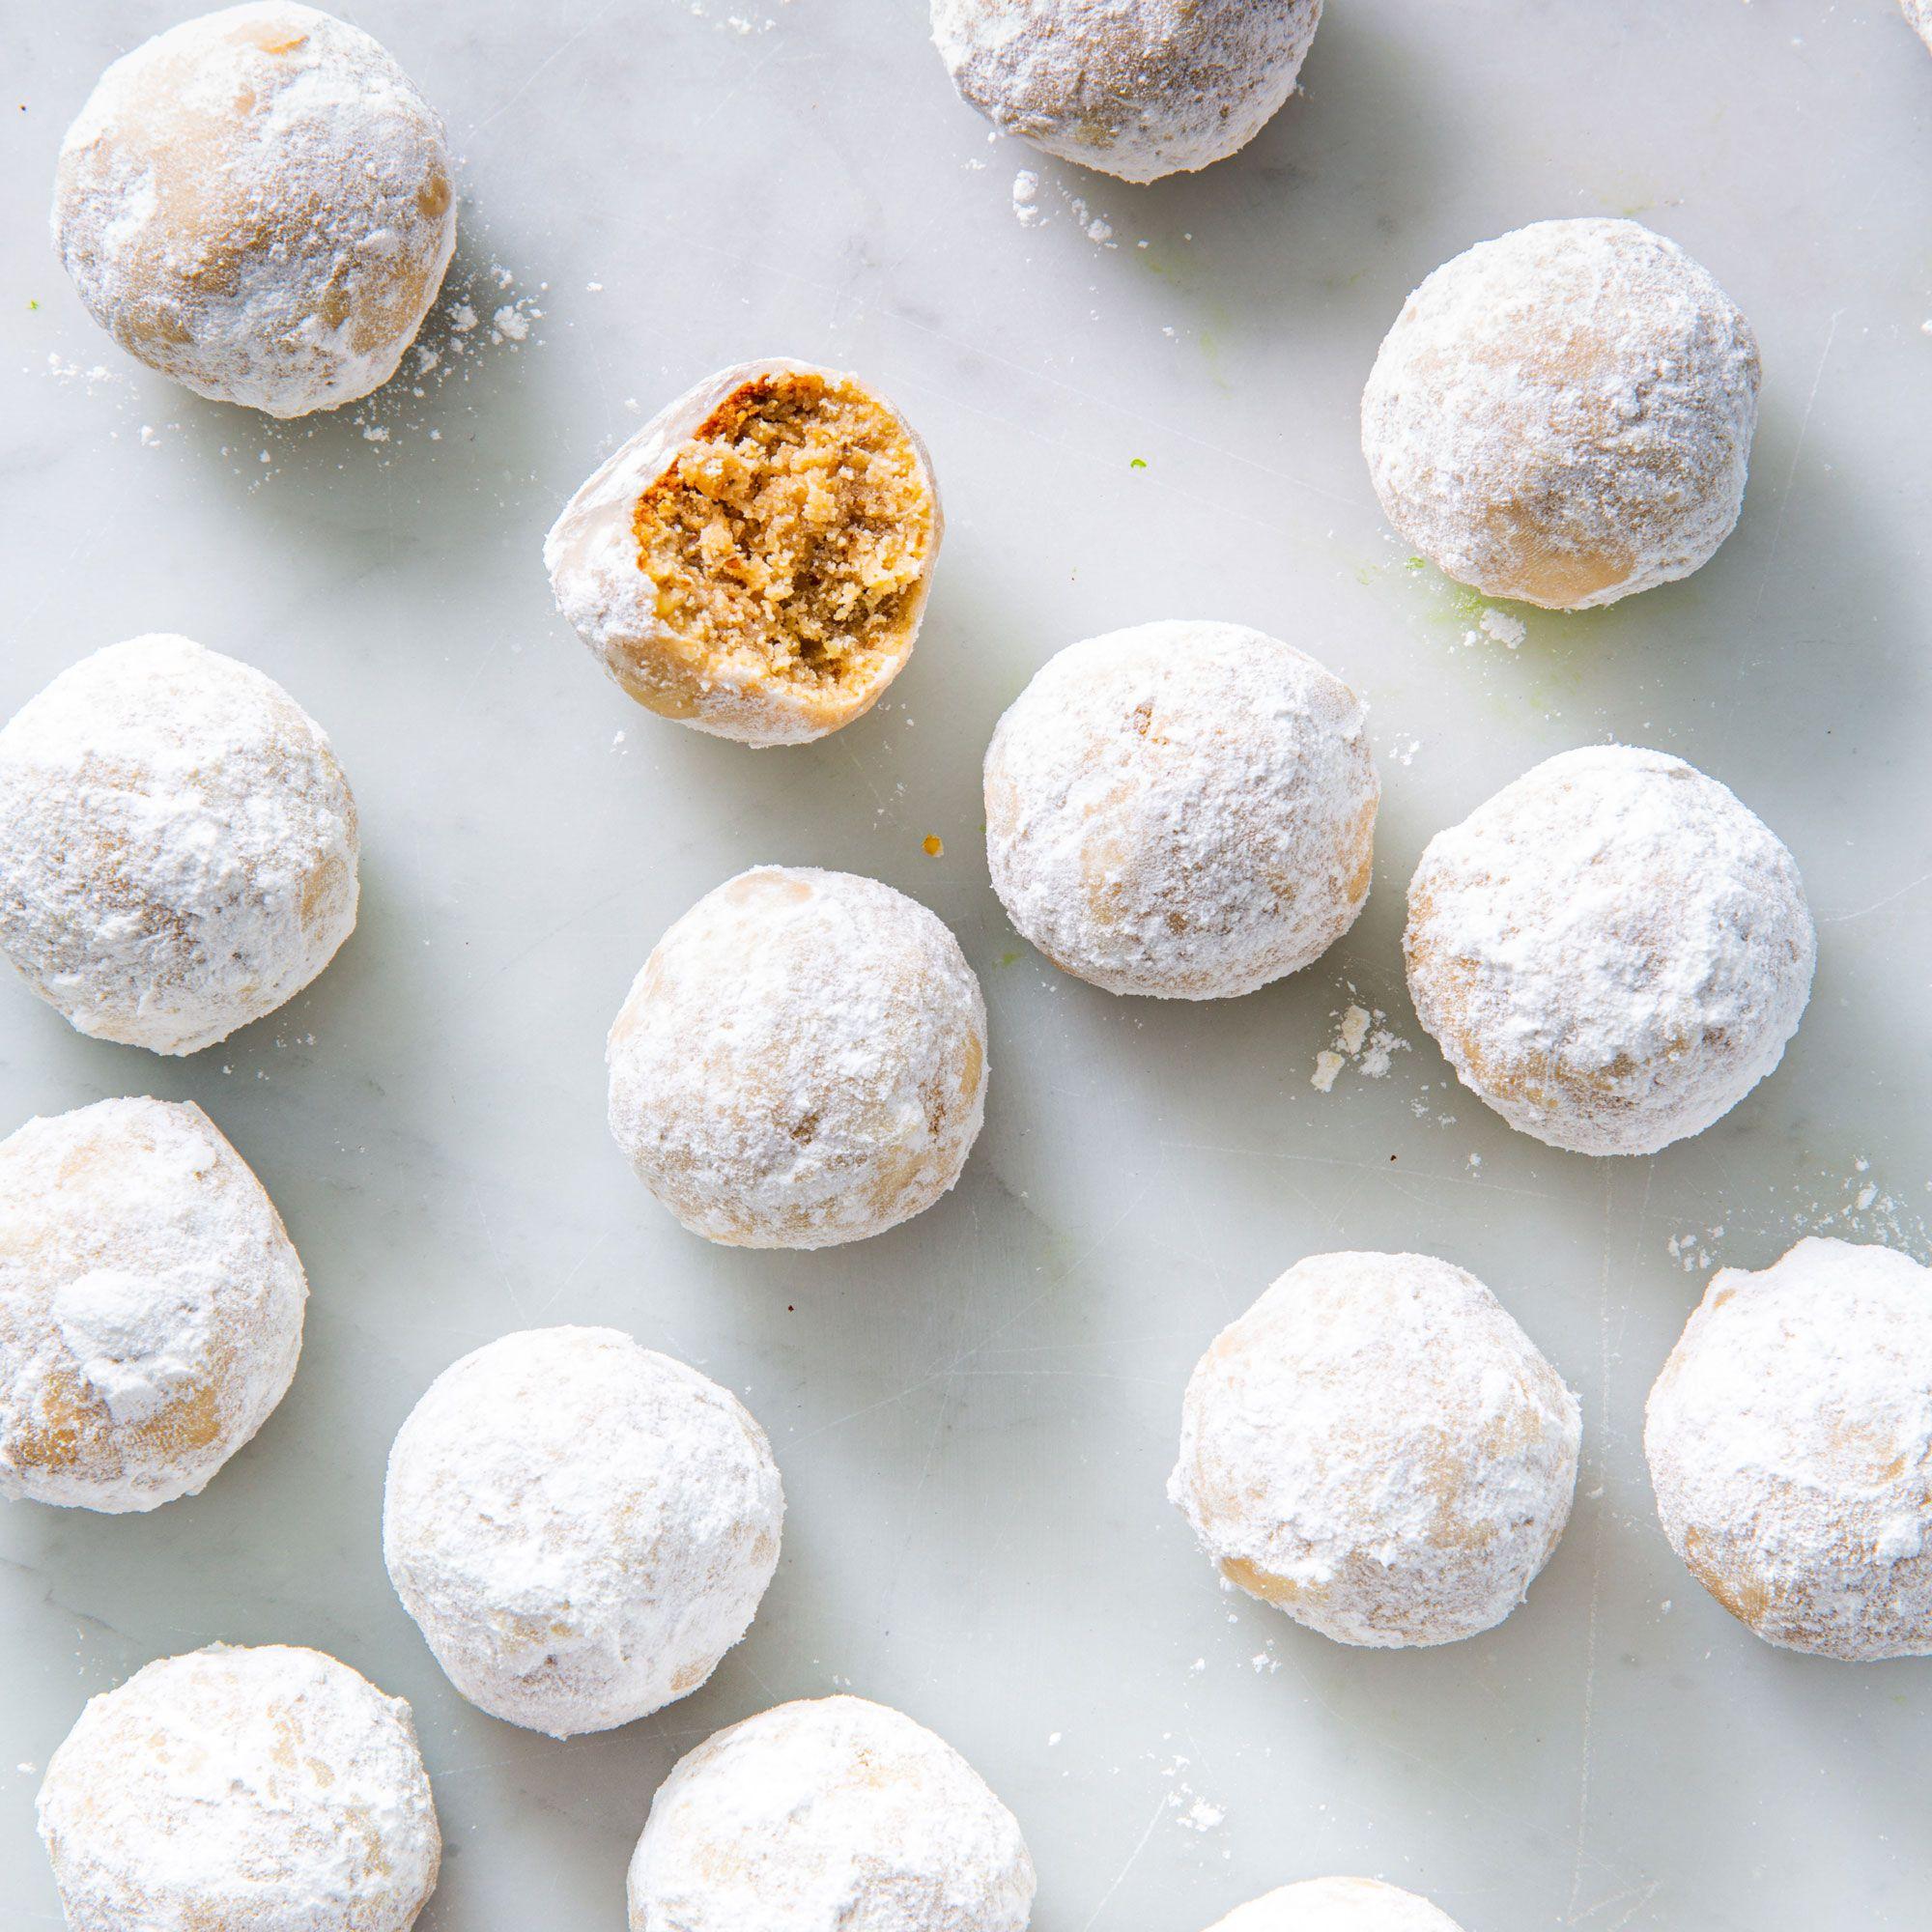 Thank you for voting for Matt and Megha's Keto Walnut Snowballs!